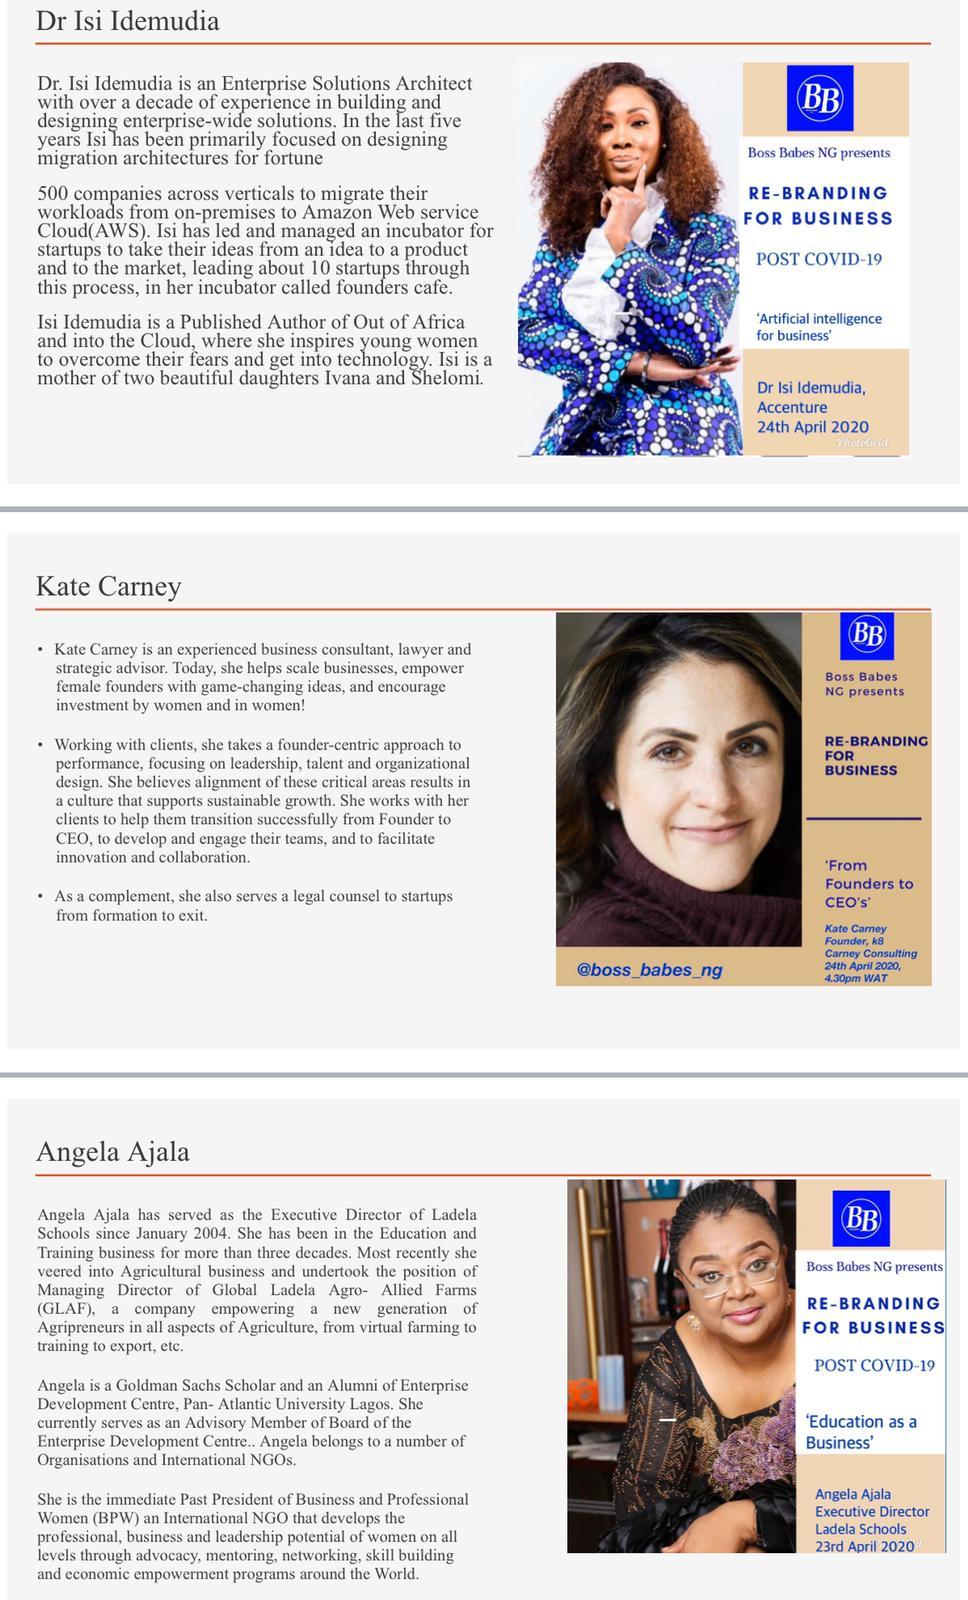 Isi Idemudia Kate Carney Angela Ajala Rebranding for business post covid-19